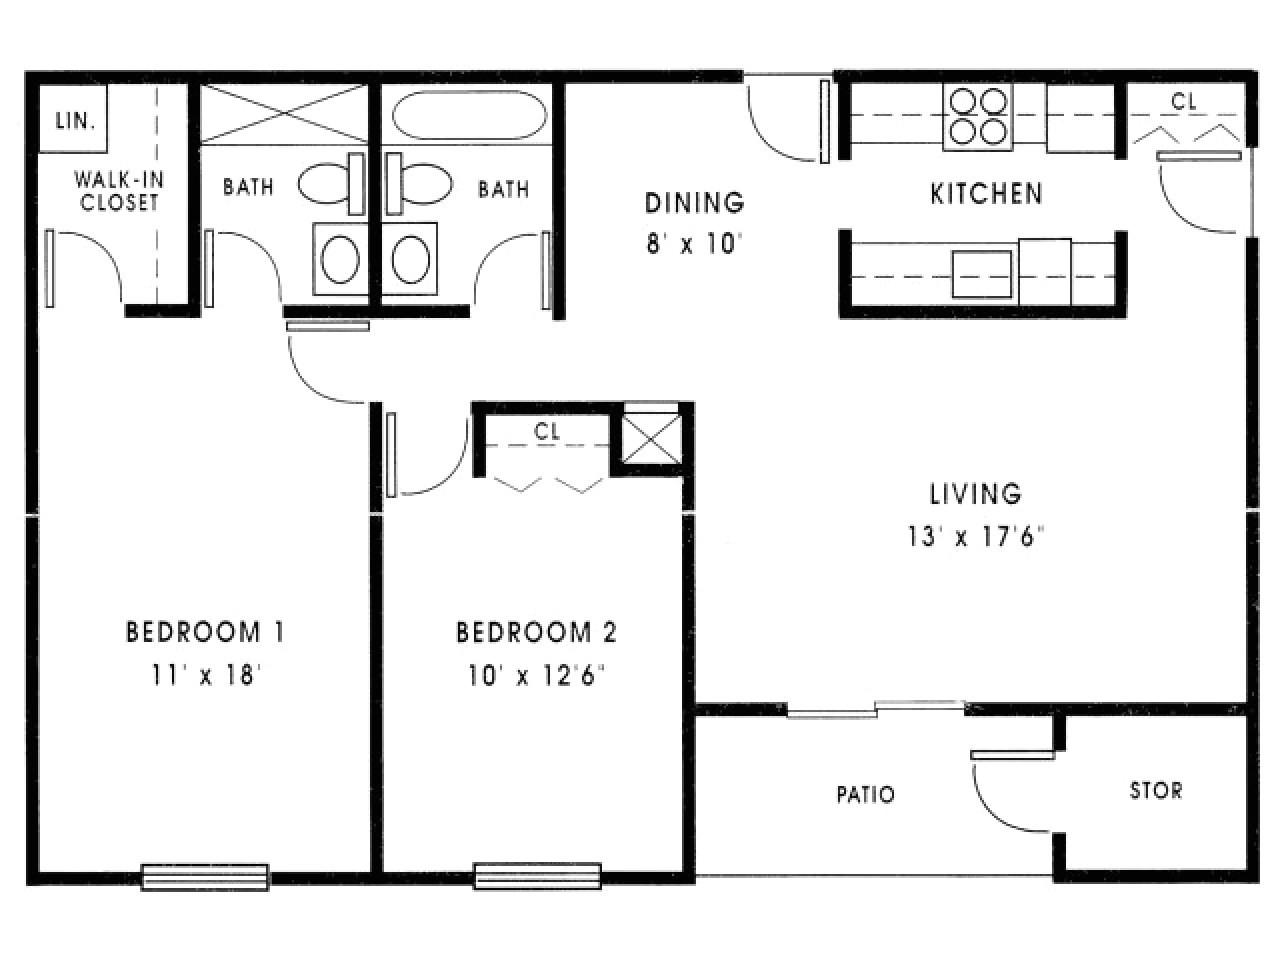 2 bedroom house plans under 1000 sq ft